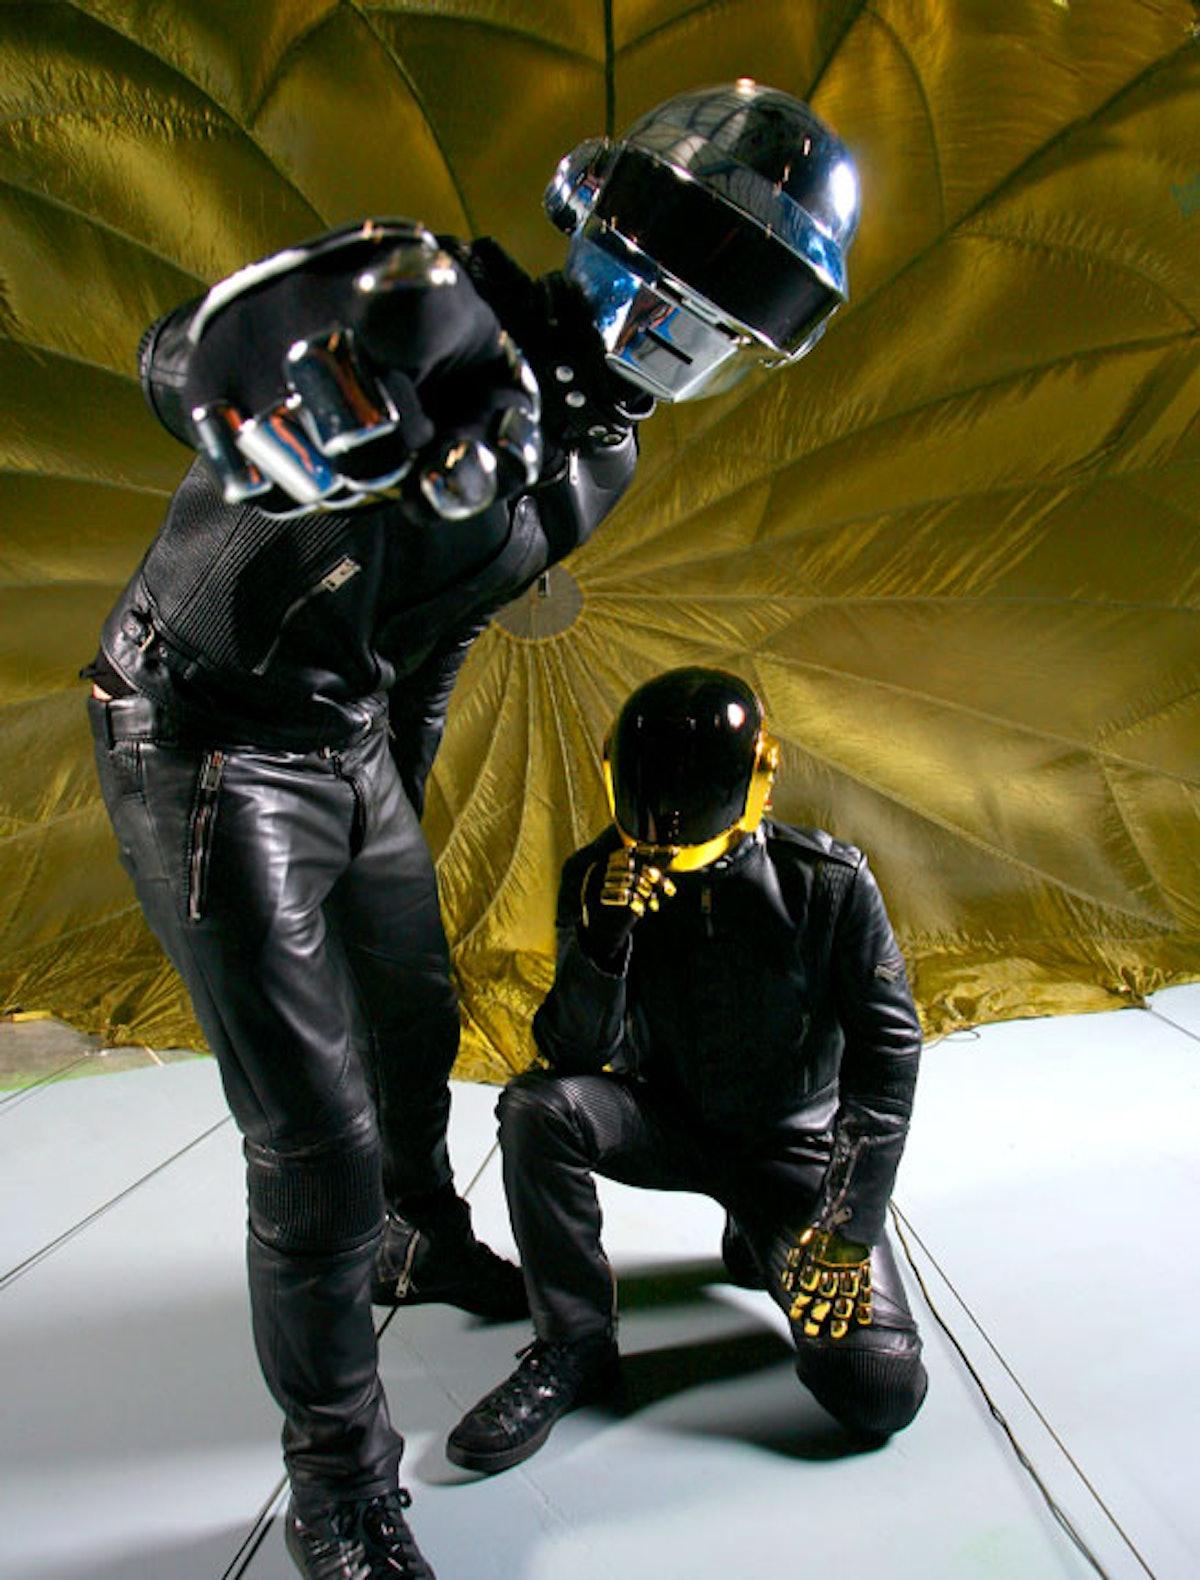 Daft Punk, Las Vegas, 2010 by Mick Rock